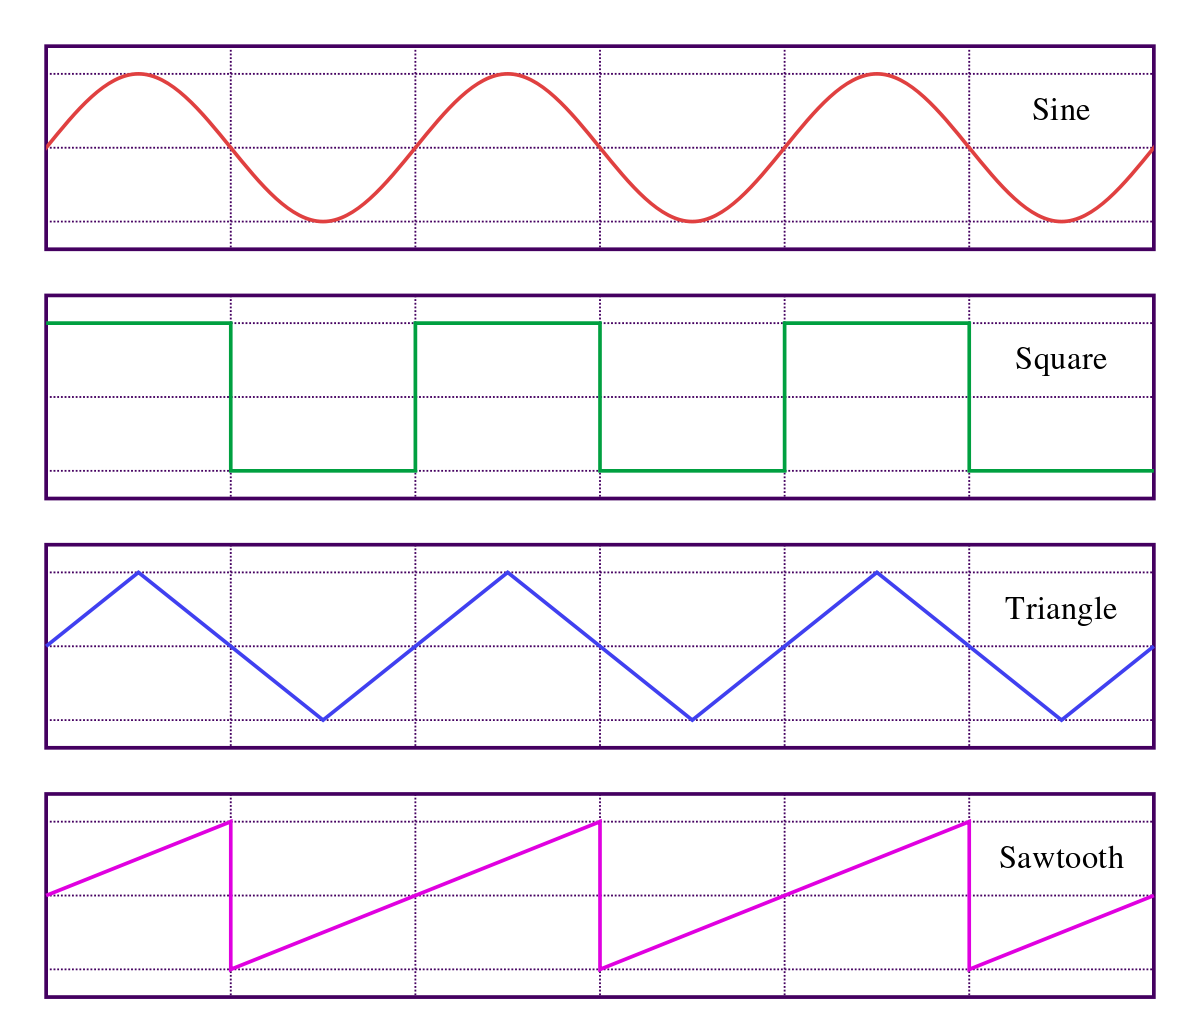 Waveform Wikipedia Sine Wave Root Mean Square Waves